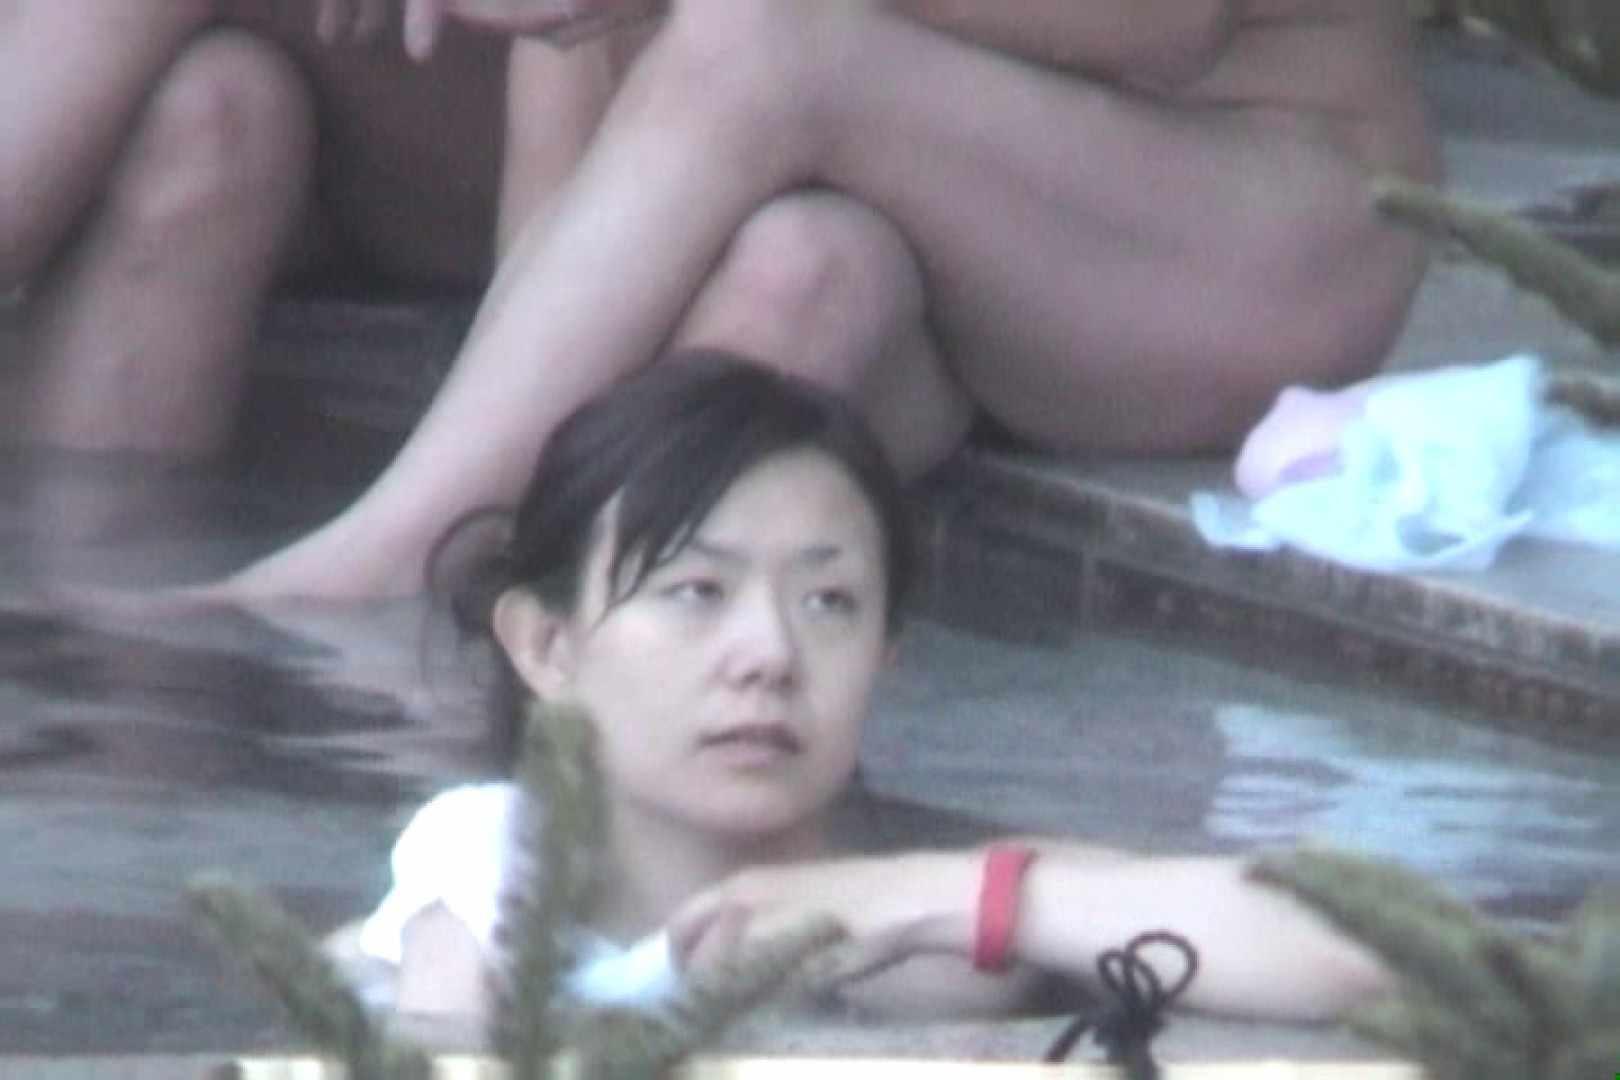 Aquaな露天風呂Vol.609 盗撮シリーズ   露天風呂編  107PIX 19